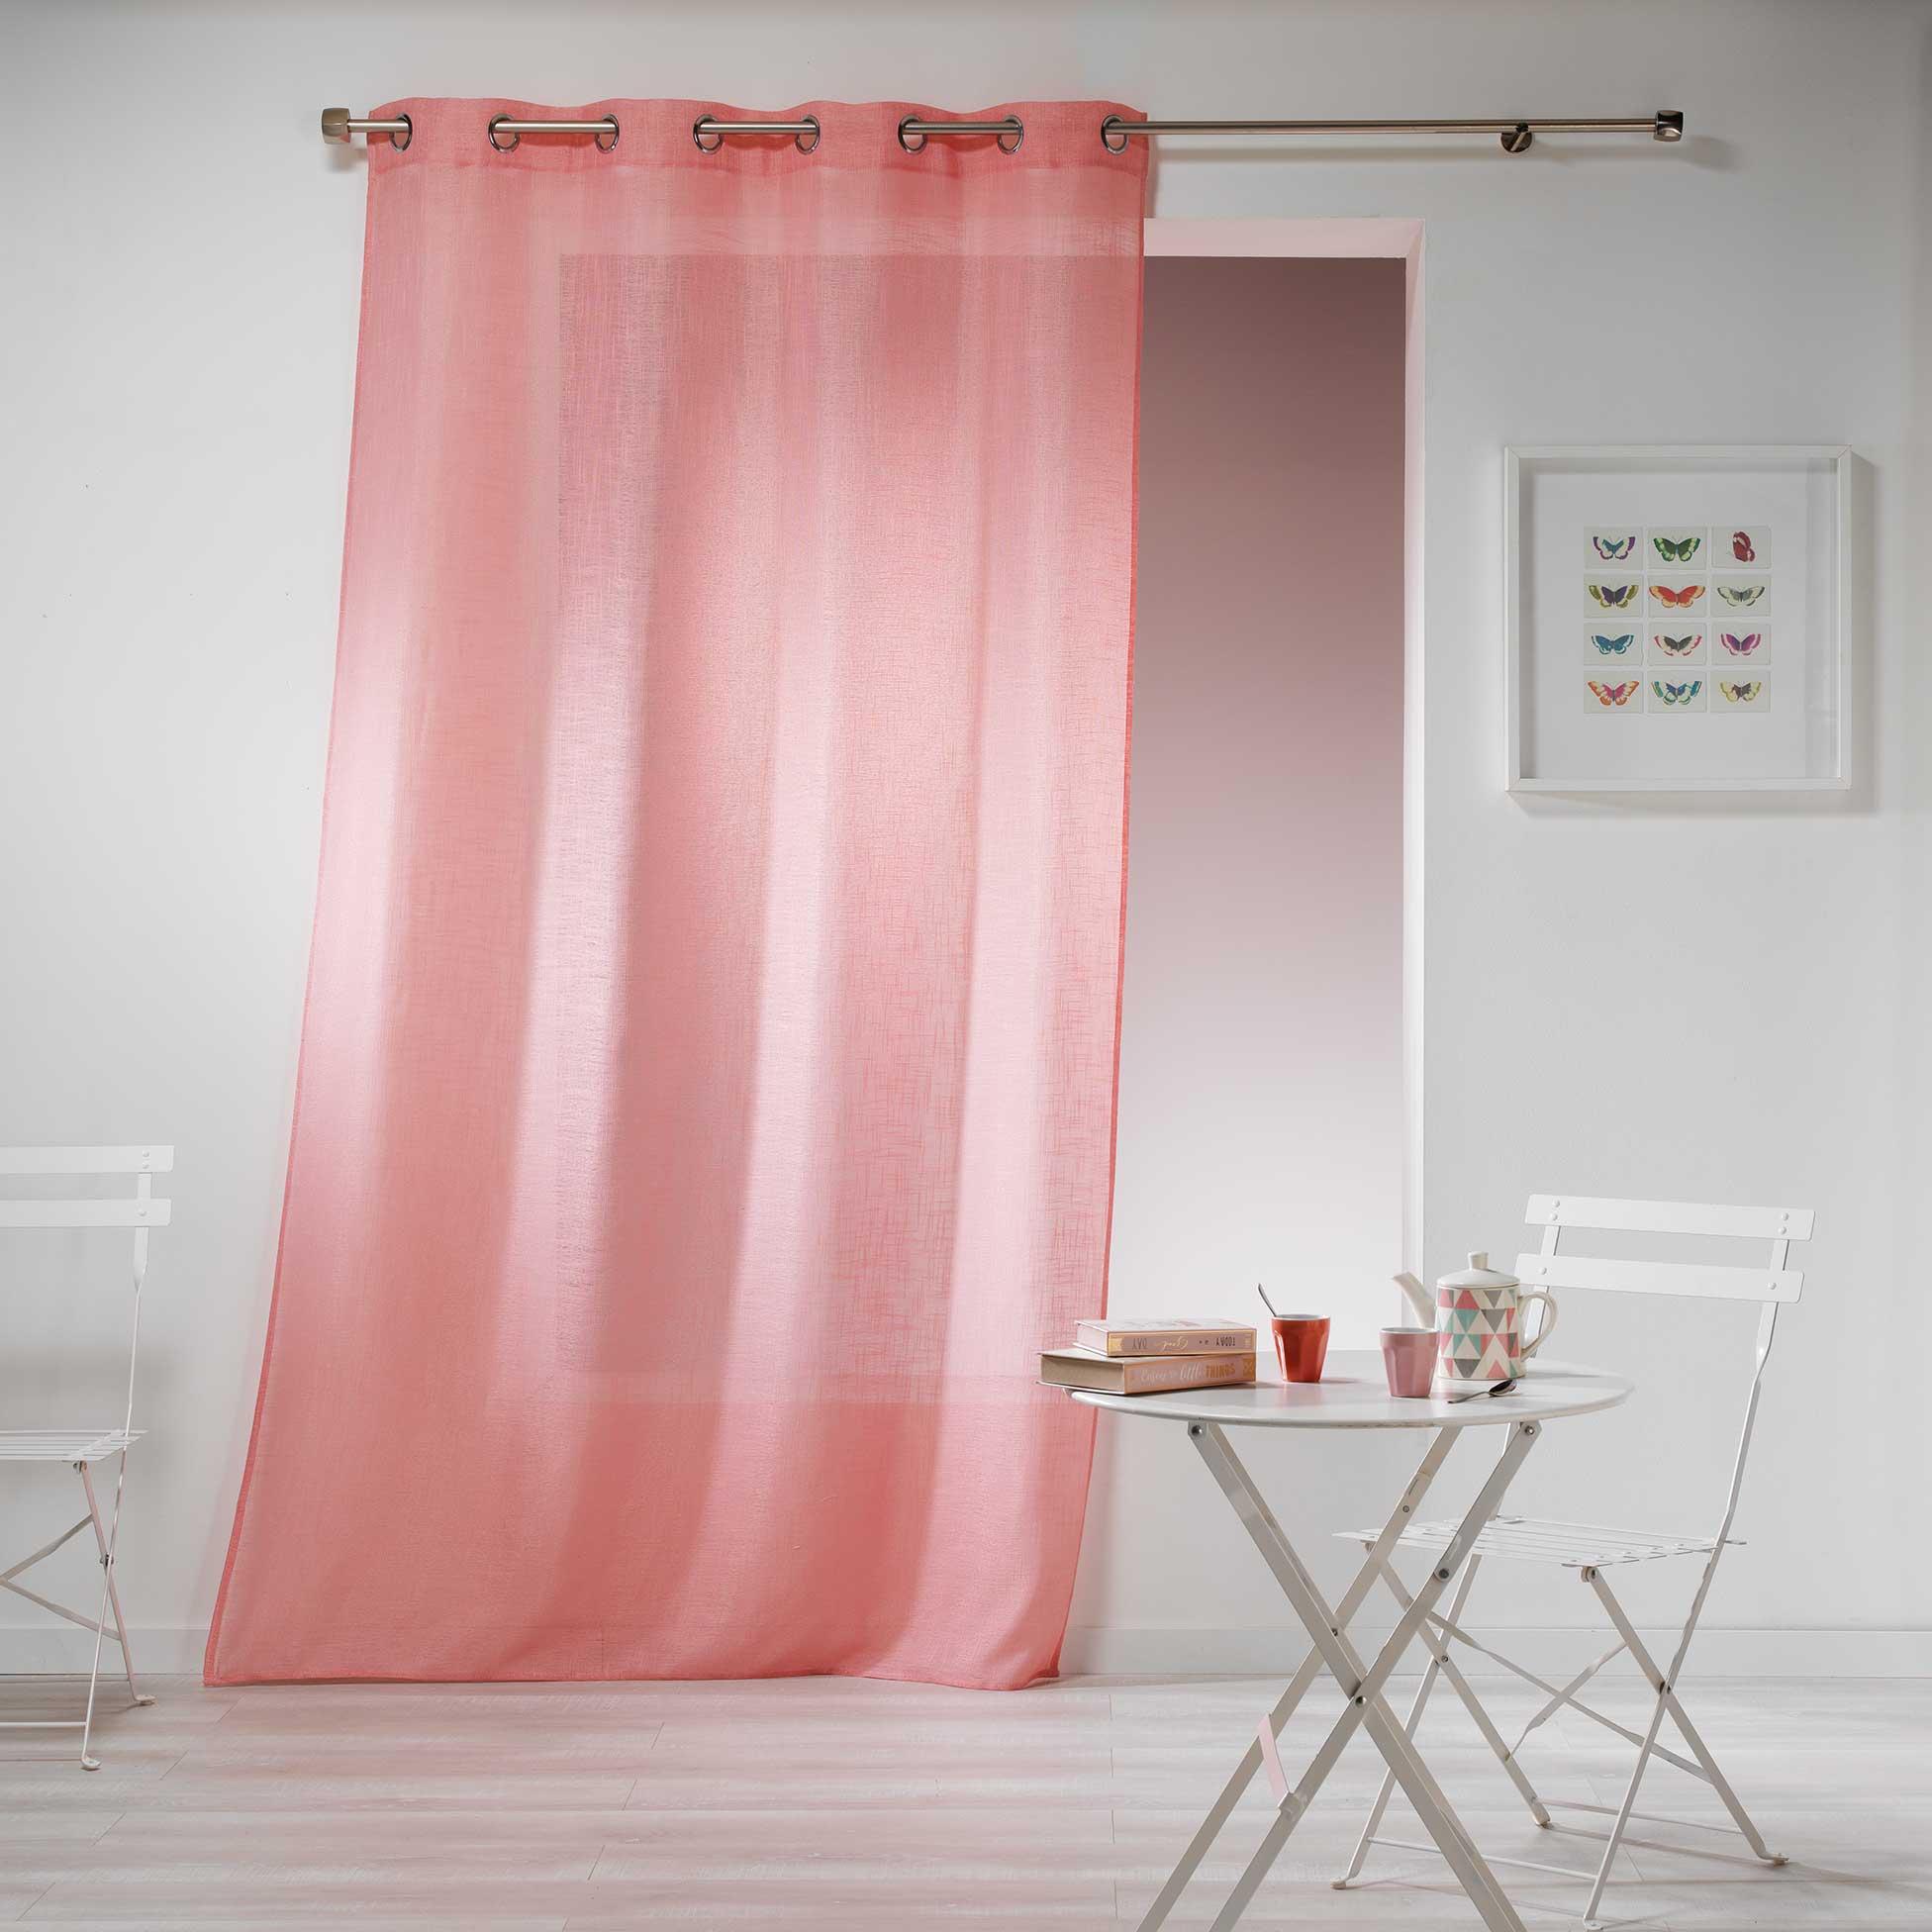 Cortina Loneta/Visillo con Ojales, Efecto Visual de Lienzo Gaya, Maquillaje rosa